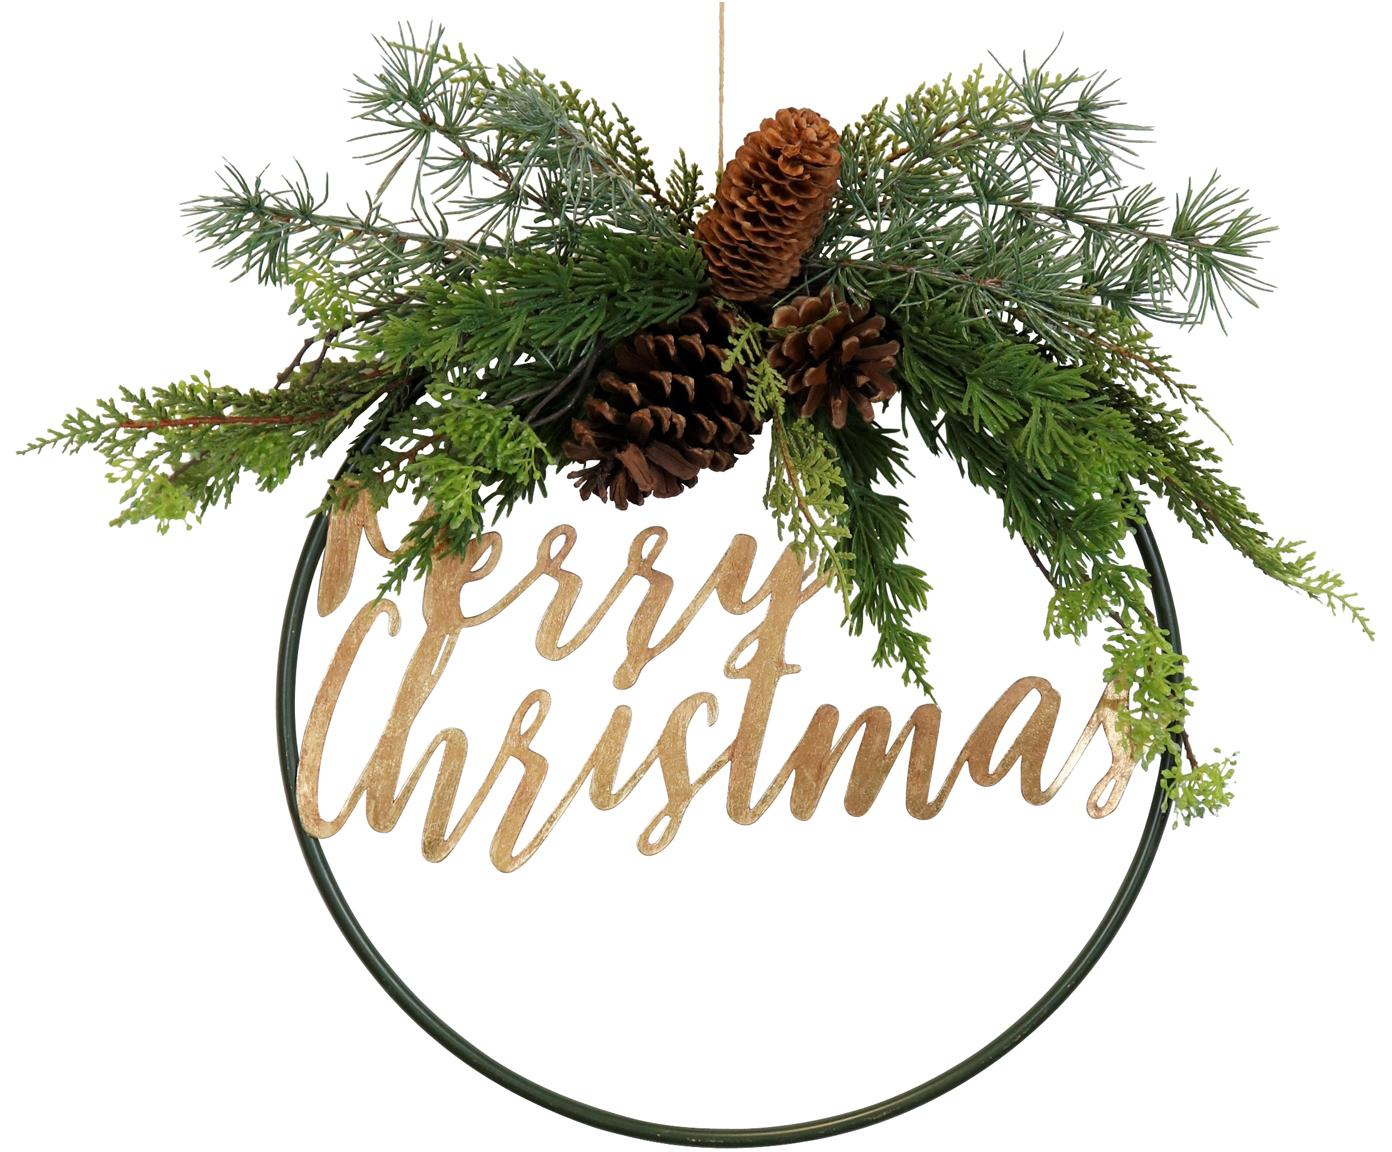 Adorno navideño Merry Christmas, Metal, plástico, piñas, Verde, marrón, Ø 36 cm